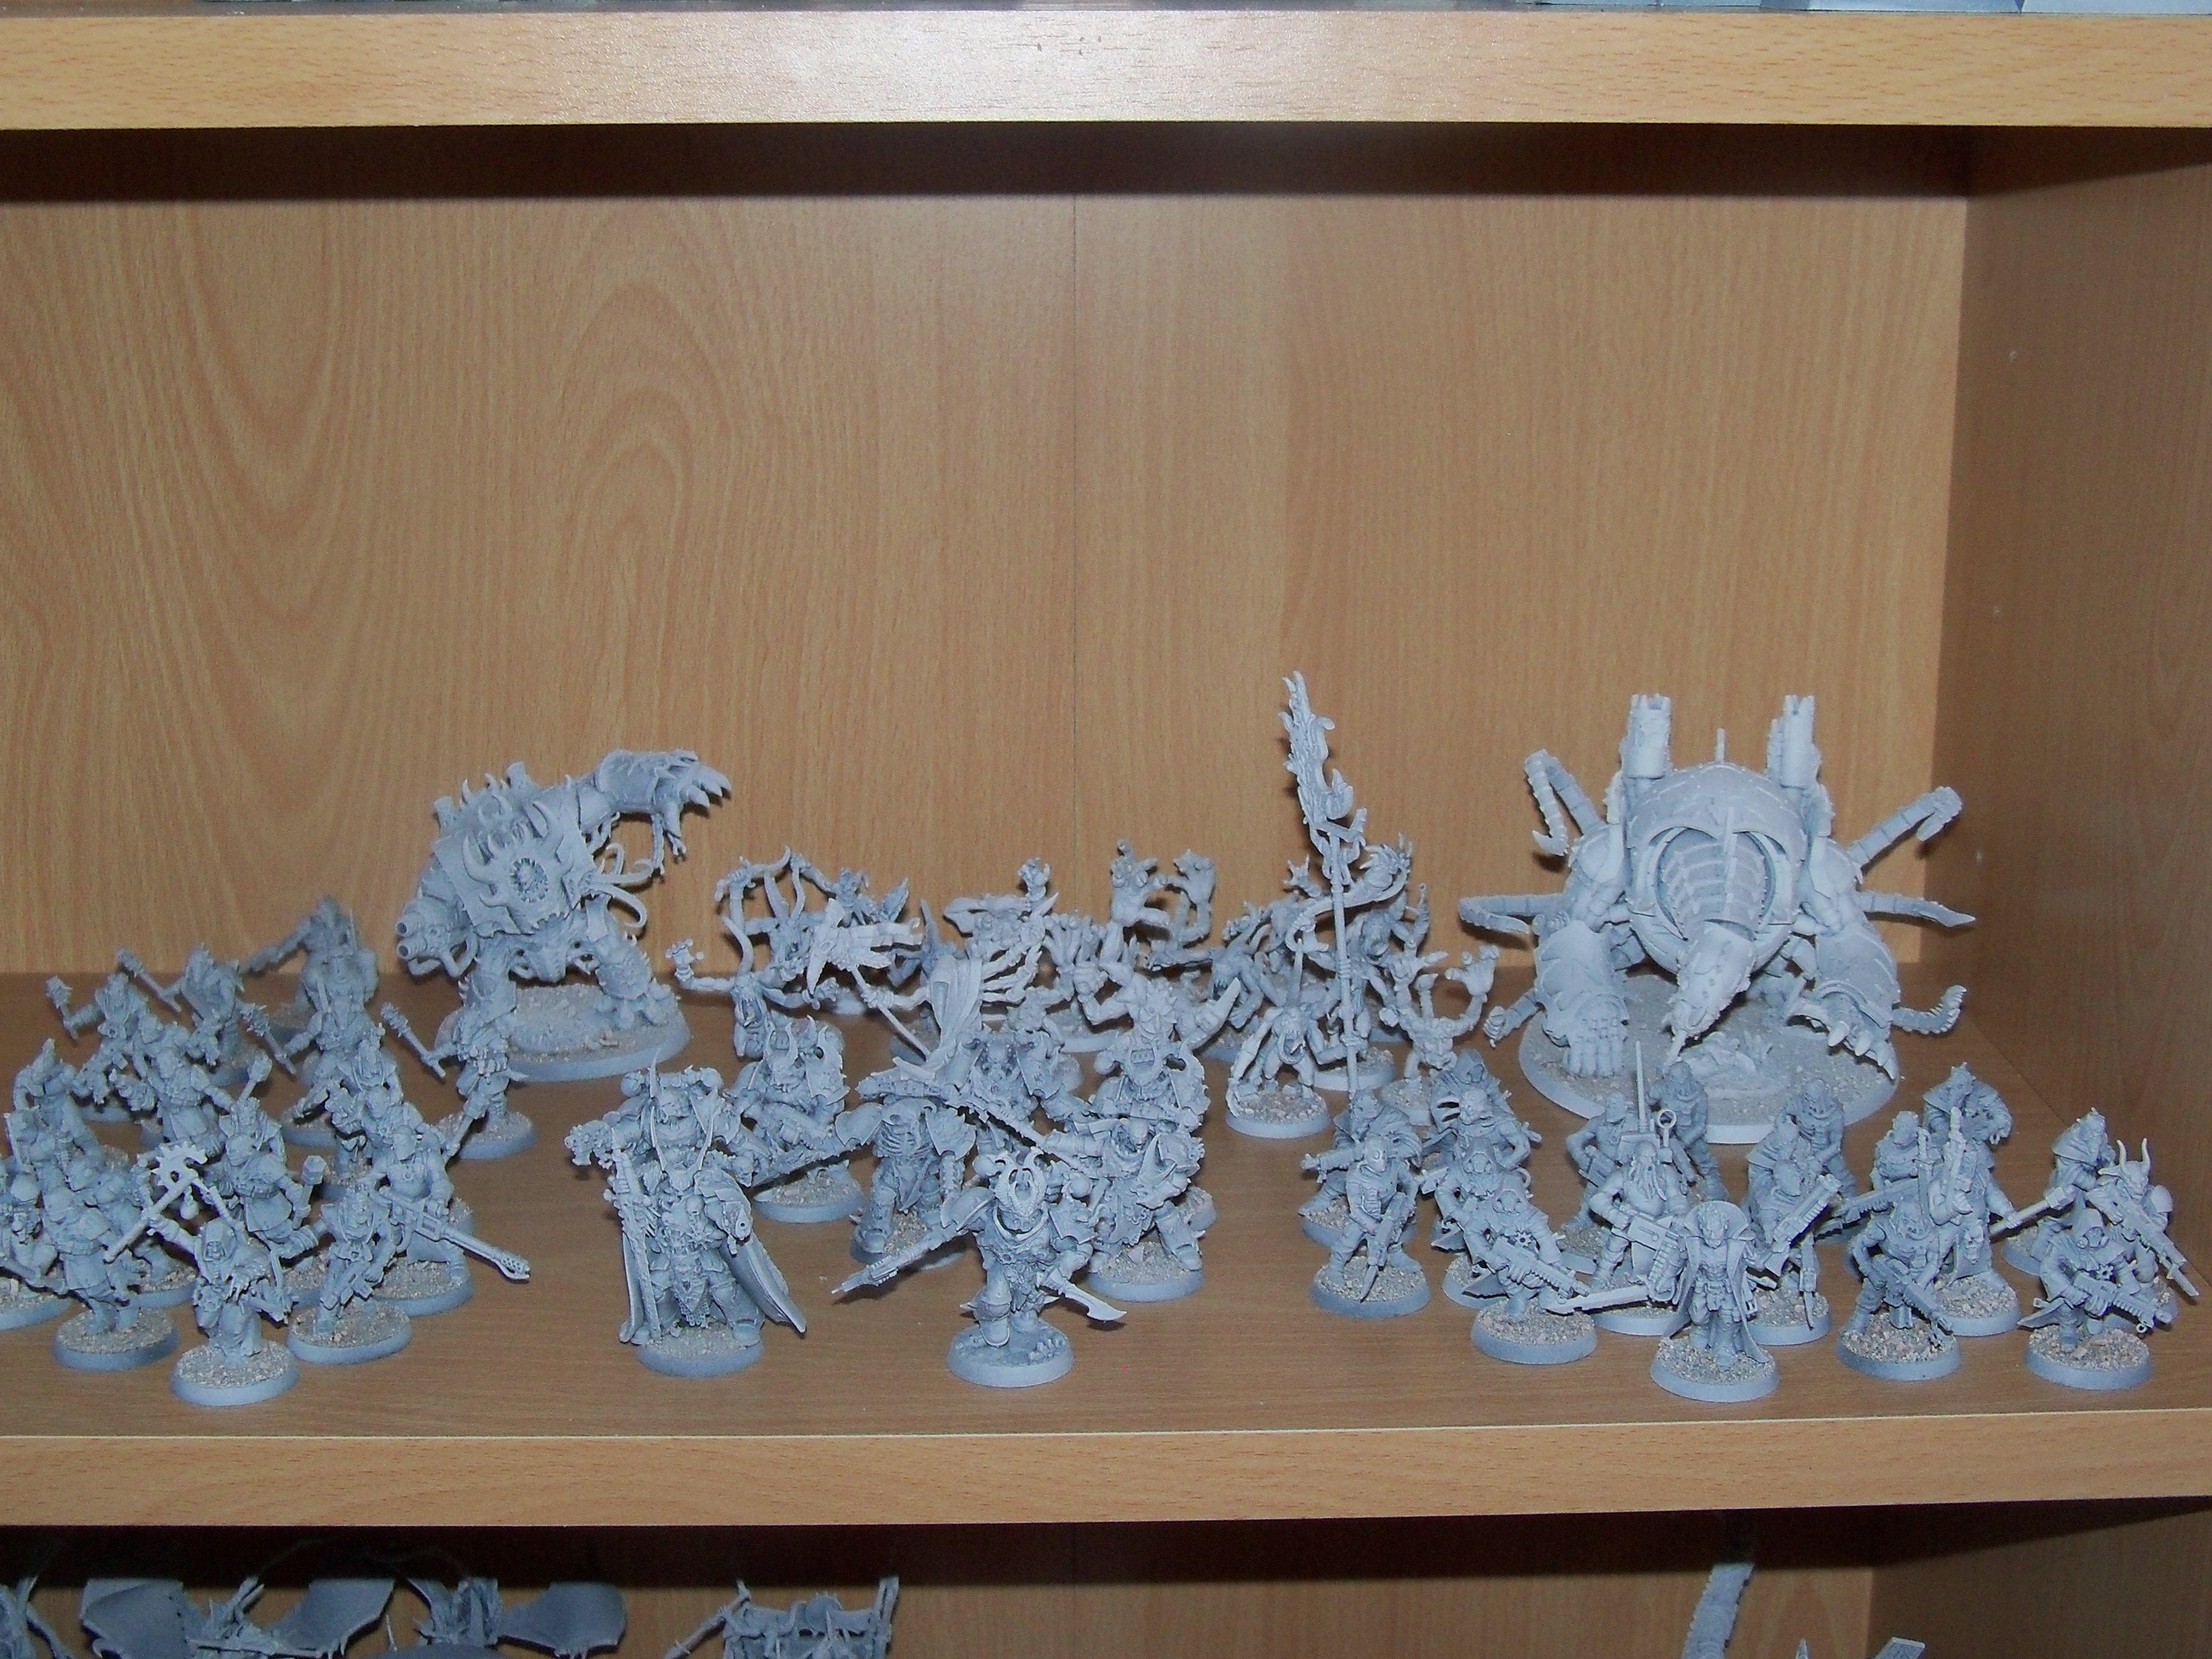 Chaos Space Marines, Warhammer 40,000